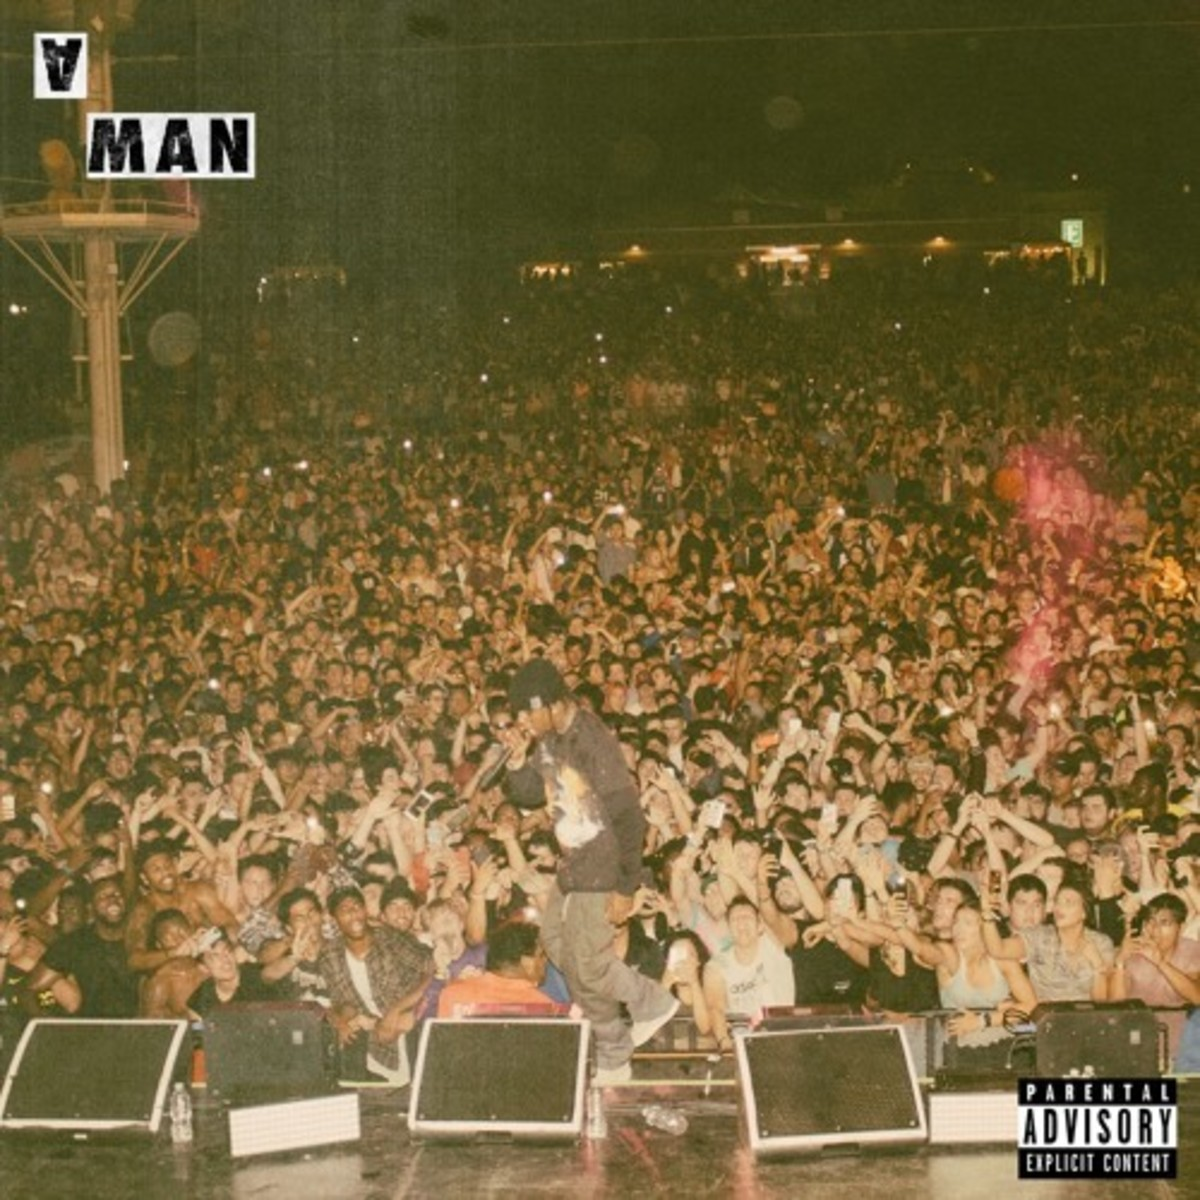 travis-scott-a-man.jpg